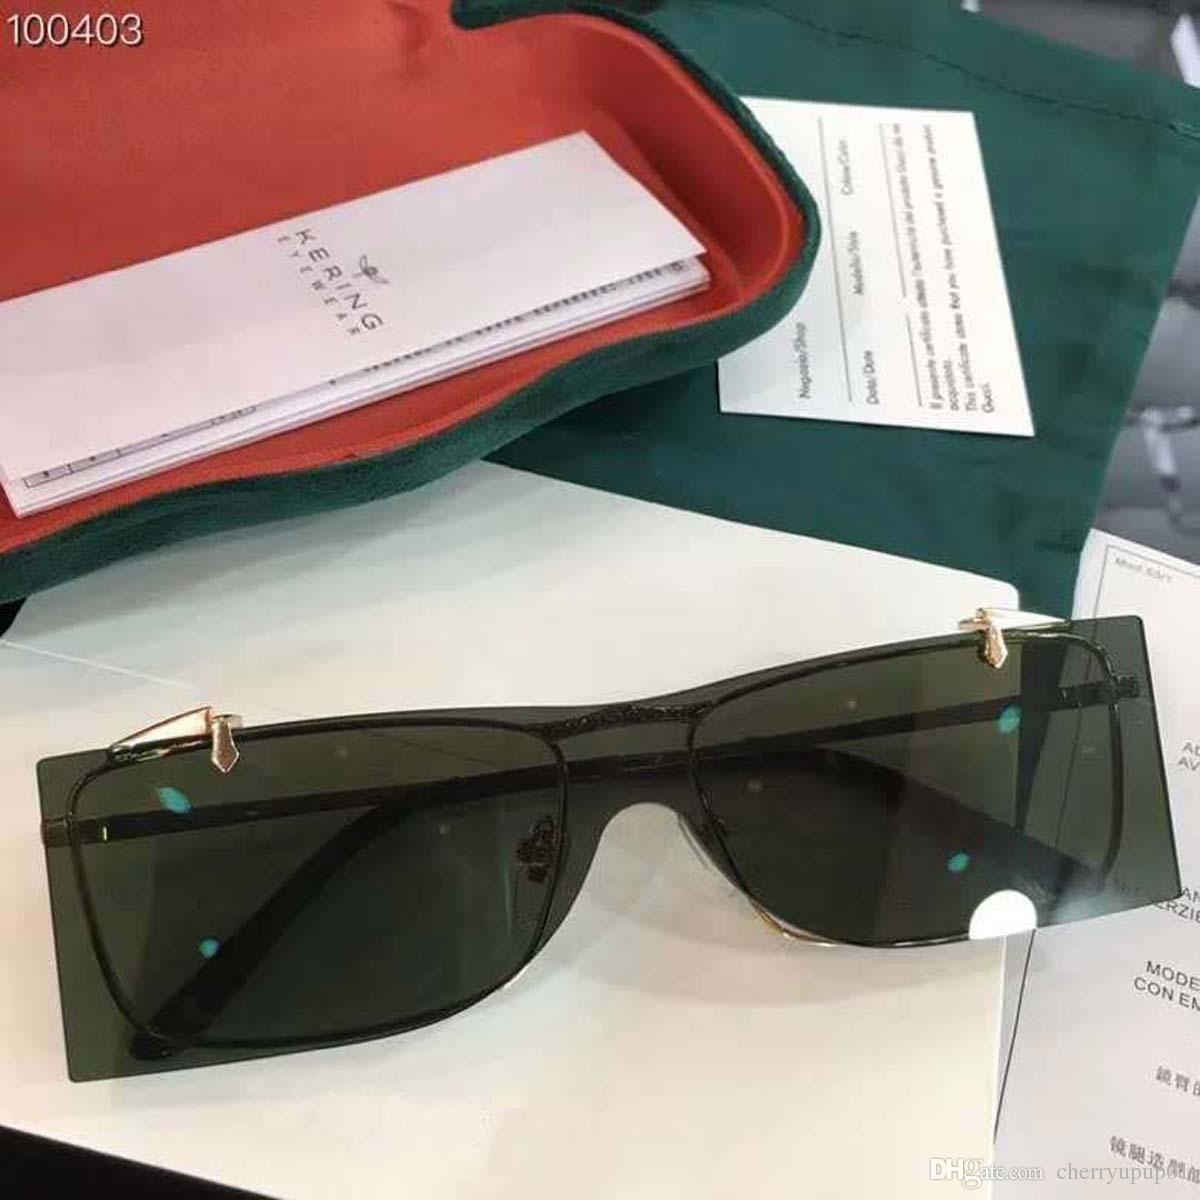 3adf703fef0d Brand Designer Sunglasses High Quality Oversiezed Sunglasses GG0363 Men  Glasses Women Sun Glasses Lens Unisex With Original Cases And Box Sunglasses  At ...